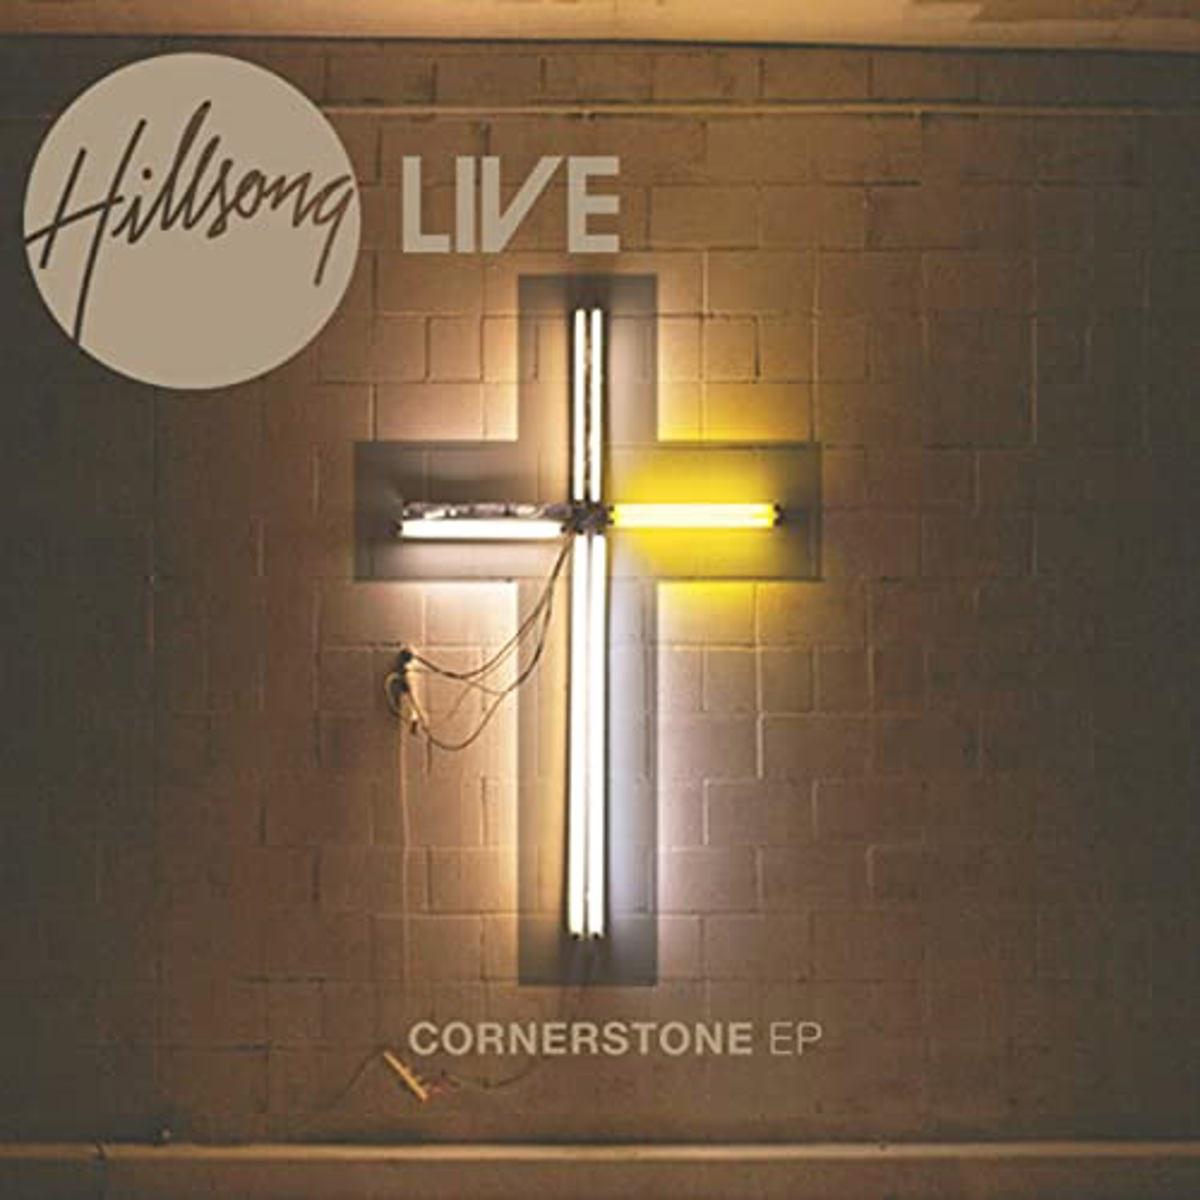 Cornerstone EP